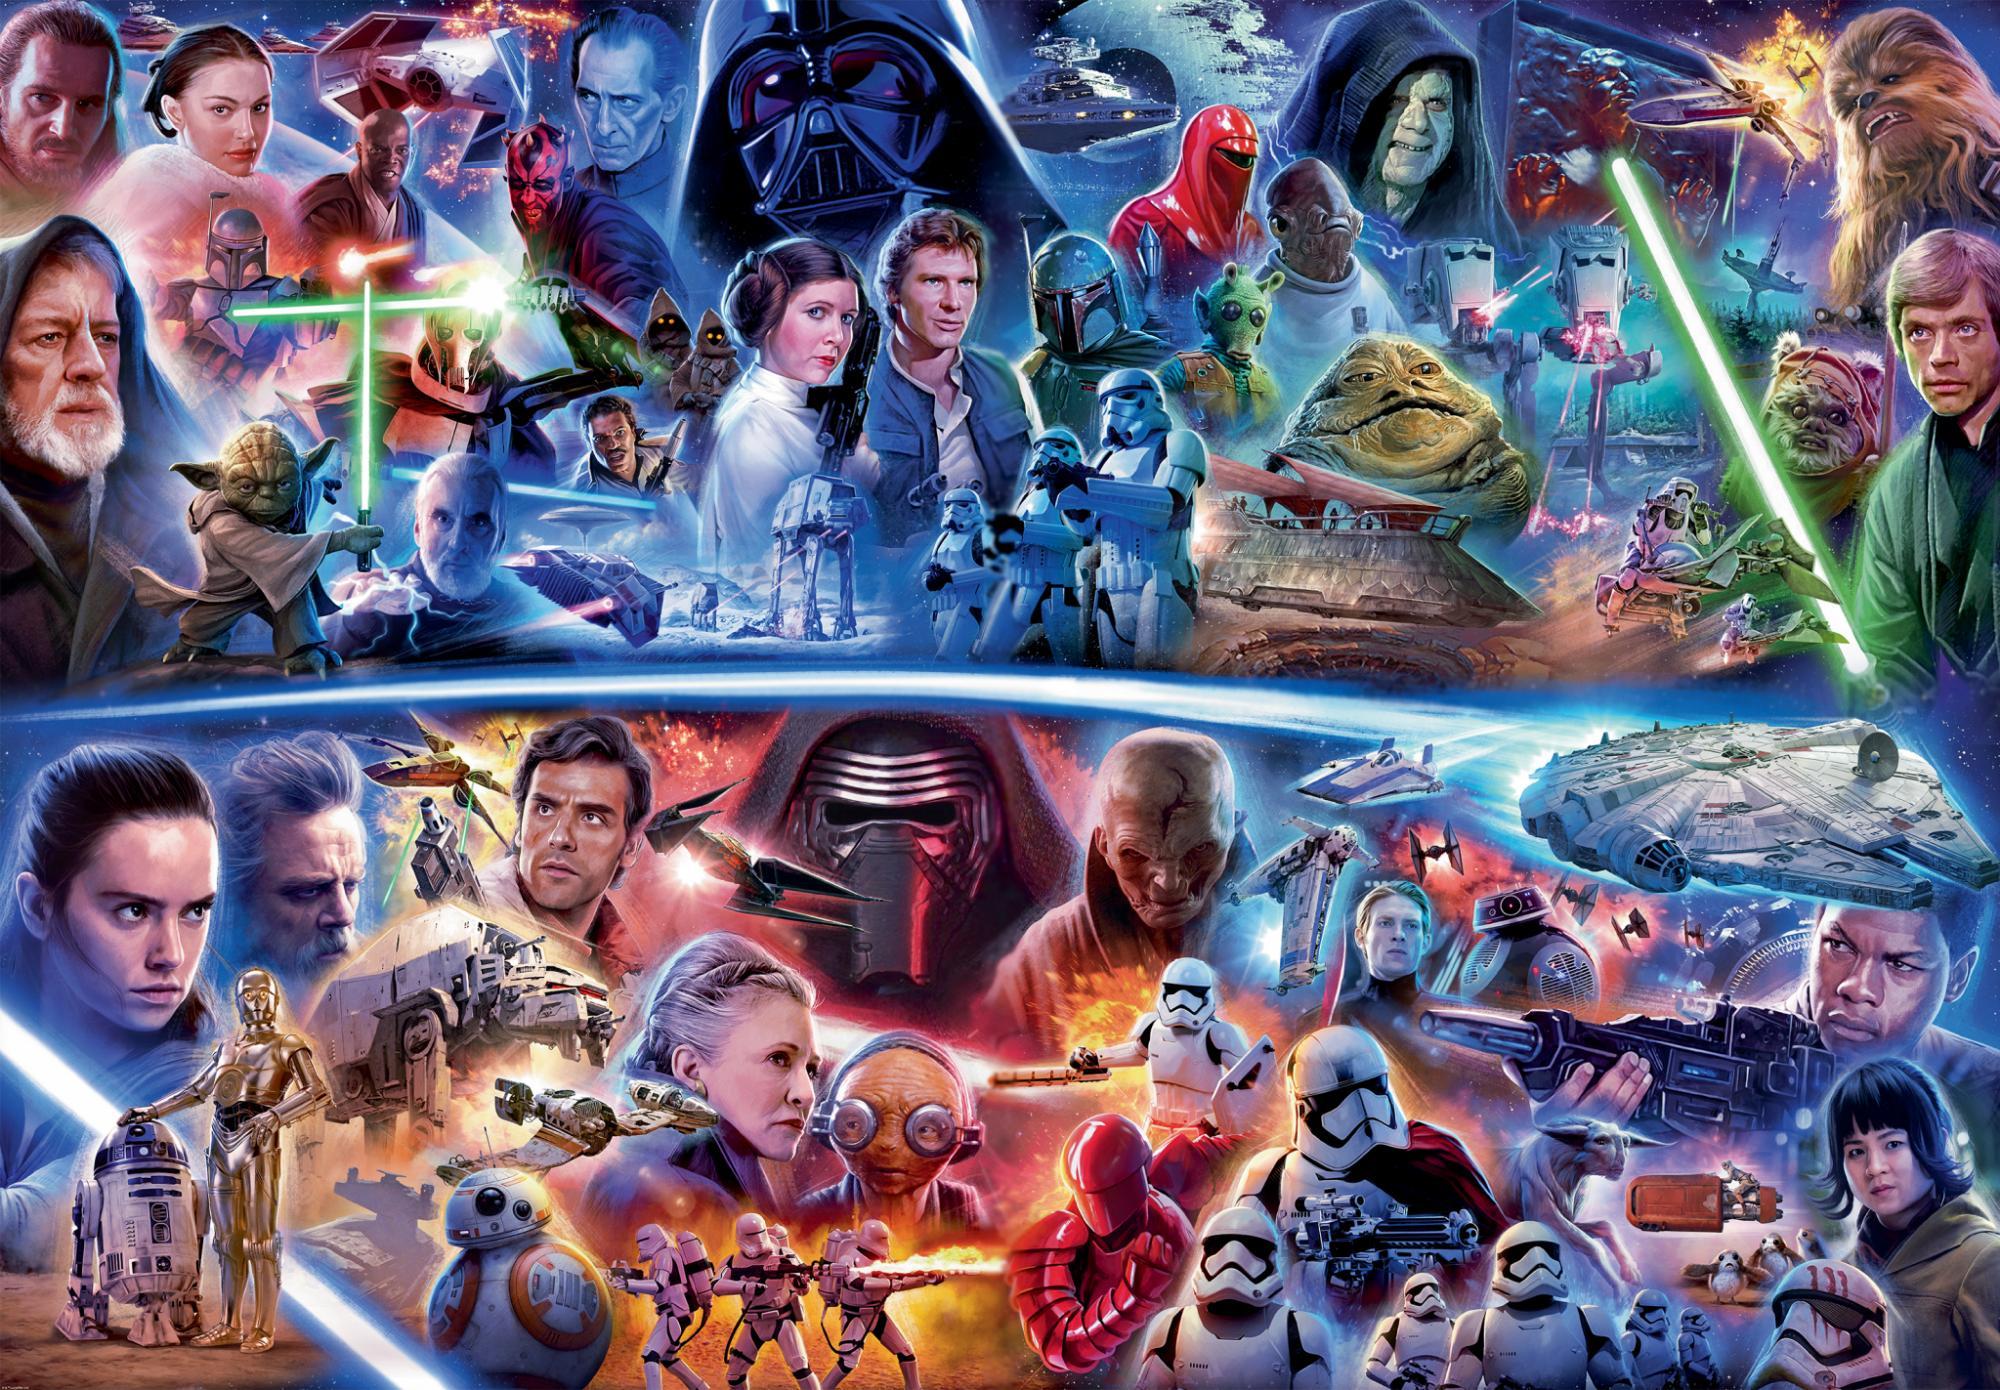 2560x1600 Star War Series 2560x1600 Resolution Wallpaper Hd